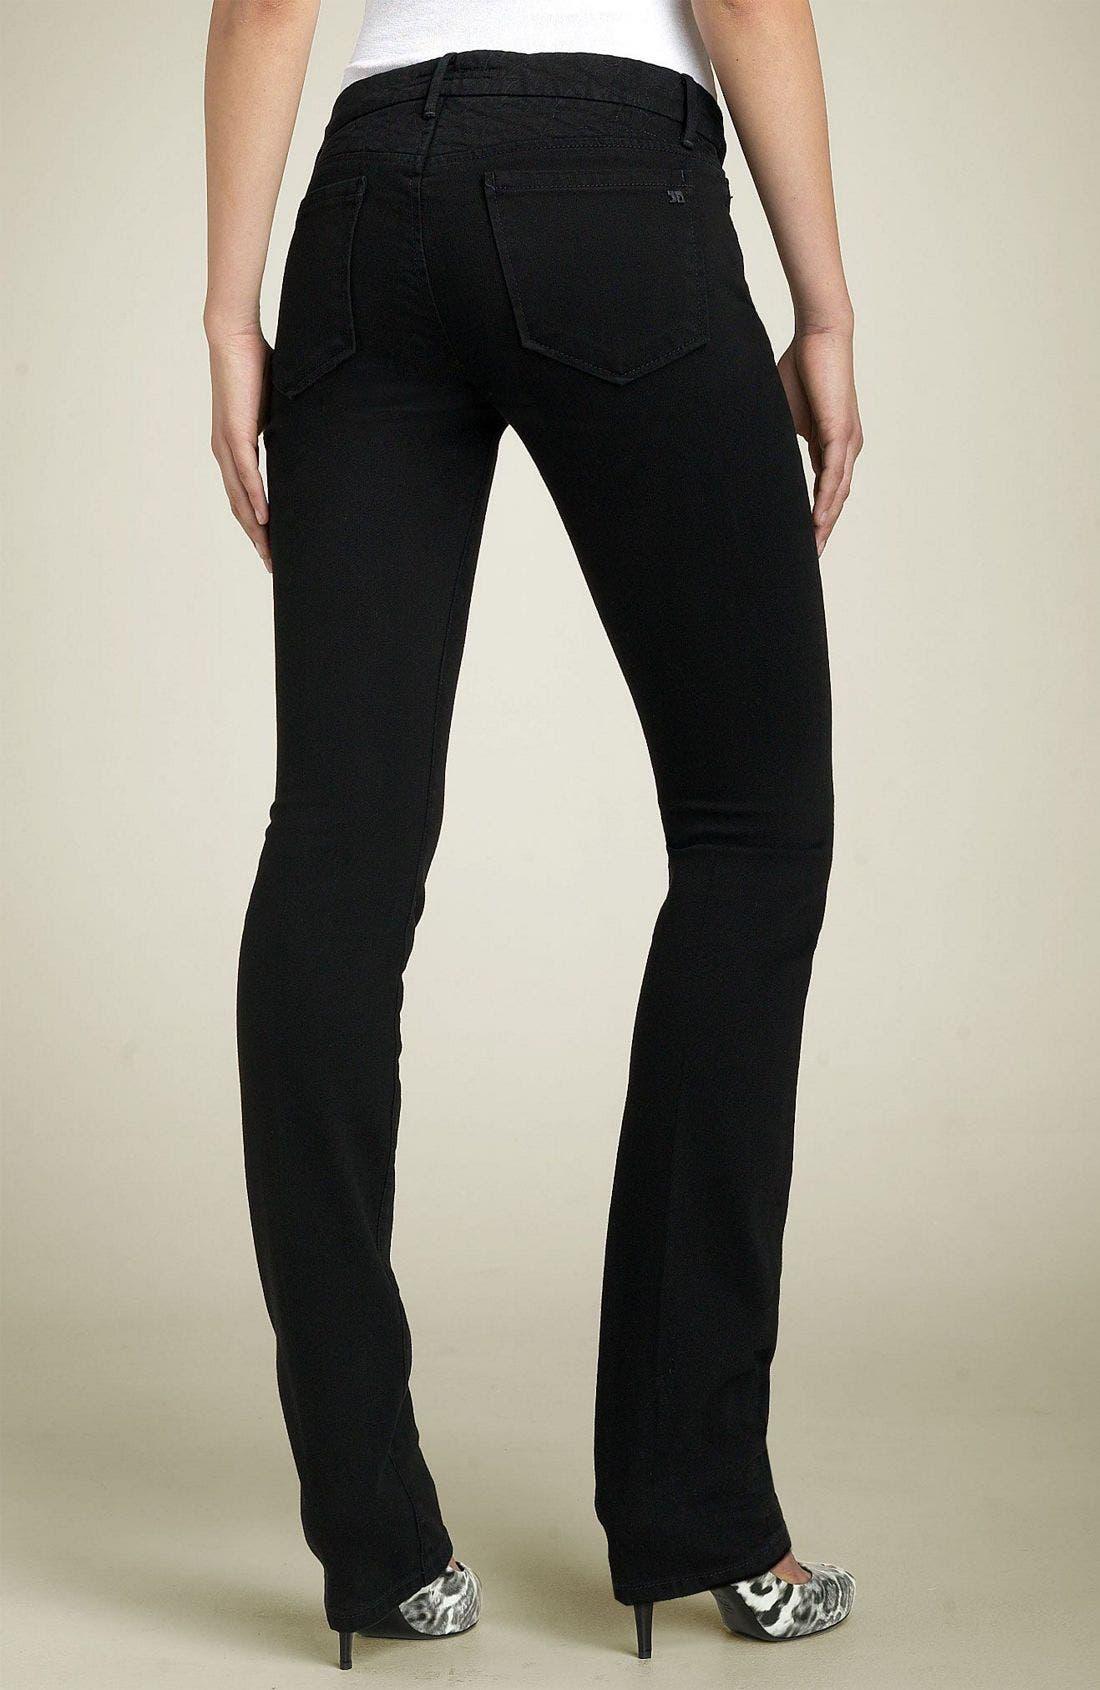 'The Cigarette' Straight Leg Stretch Jeans, Main, color, 001